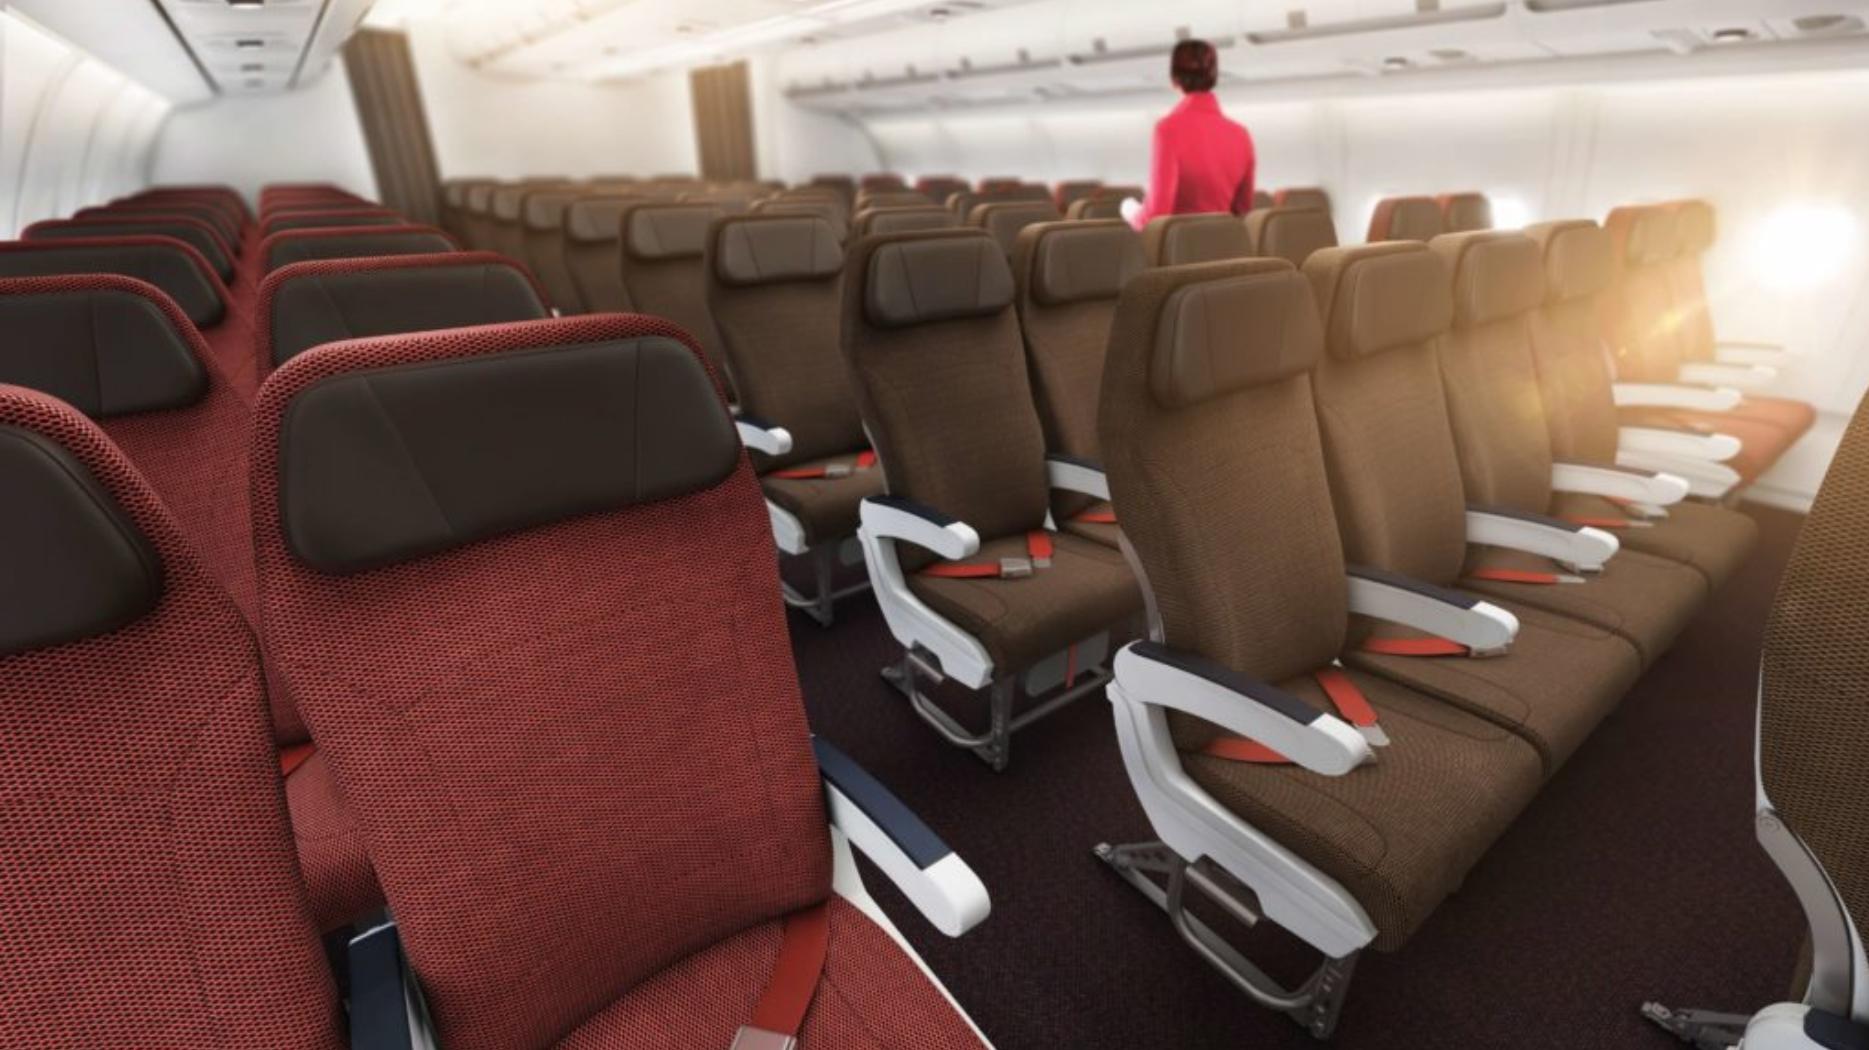 Virgin Atlantic A330-200's unveiled – using old Air Berlin